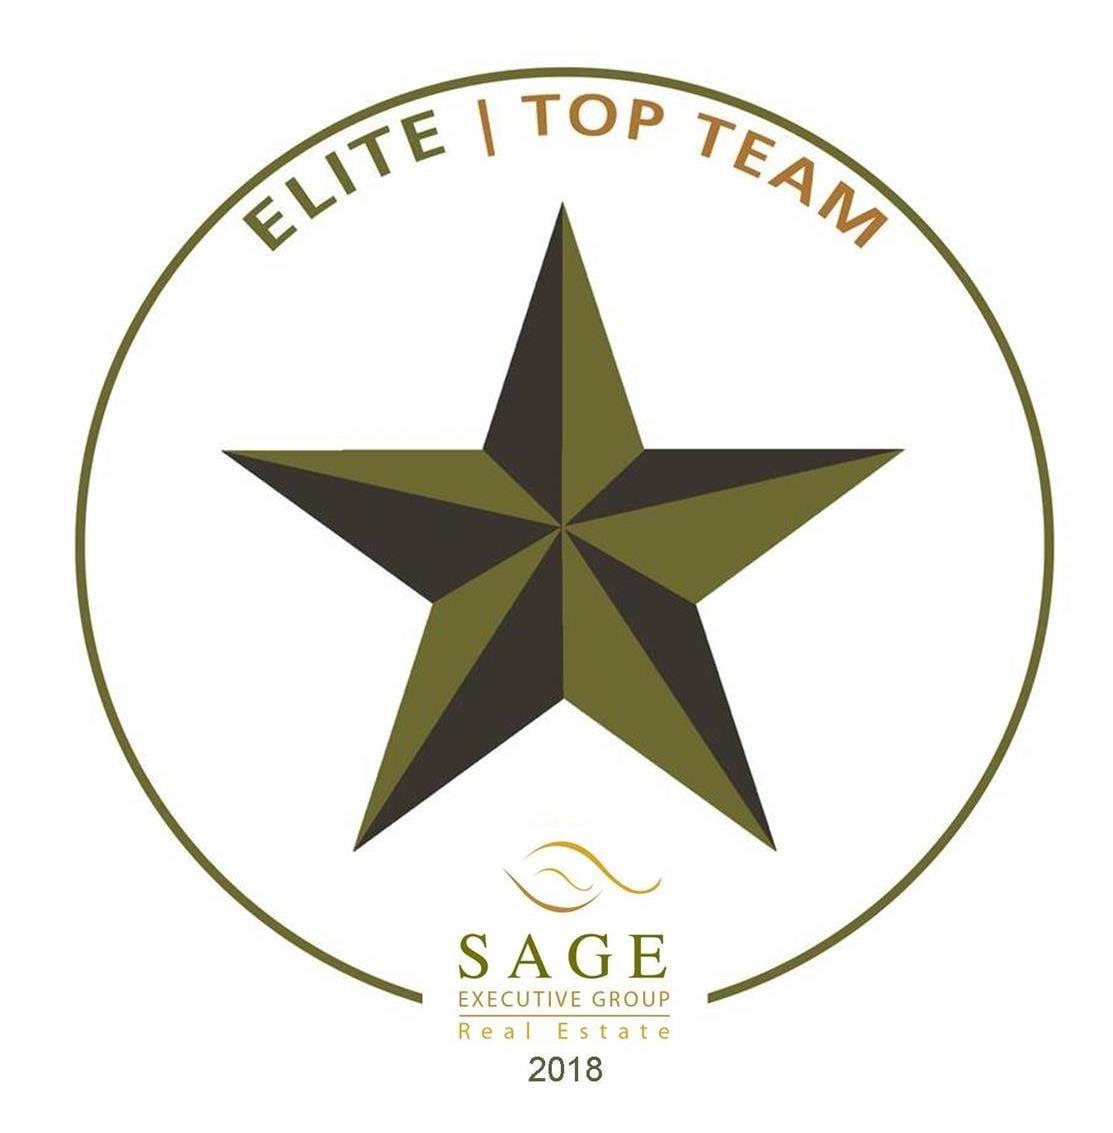 Top Real Estate Team Sage Executive Group 2018